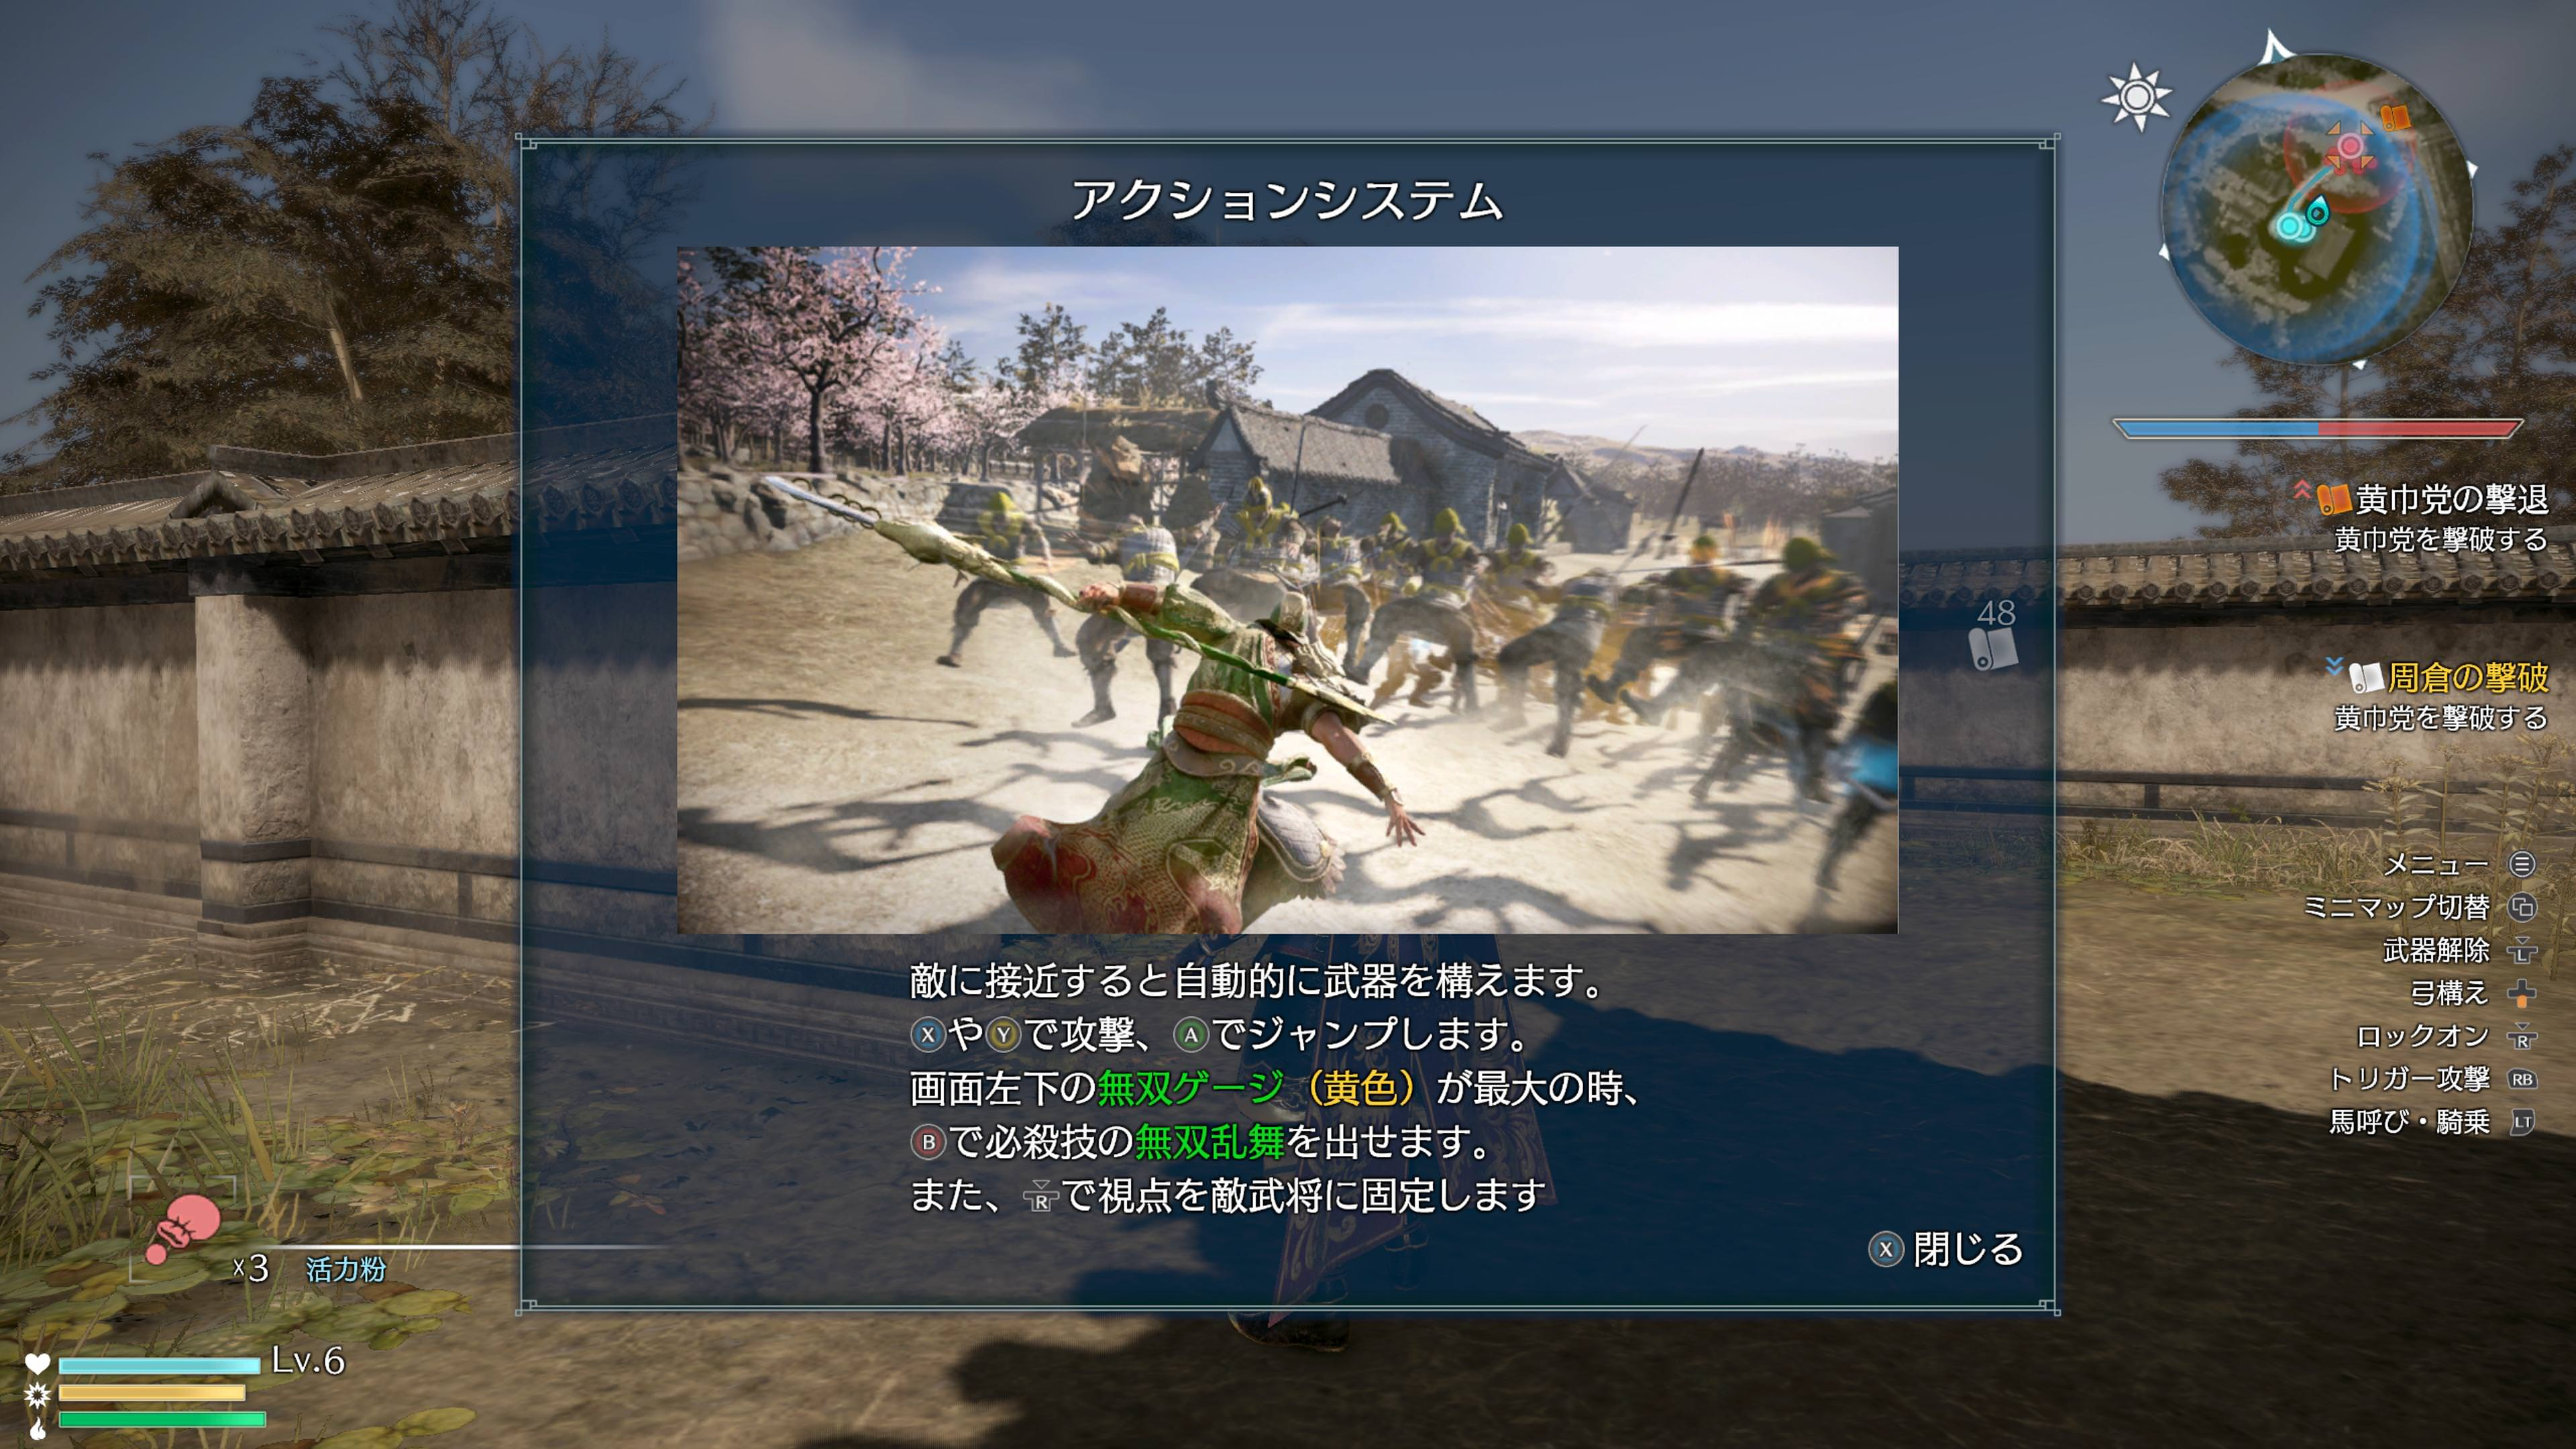 OzaNkhpPIQPH0 【朗報】XBOXONE北米版真三國無双8が完全日本語化されている事が判明!!!